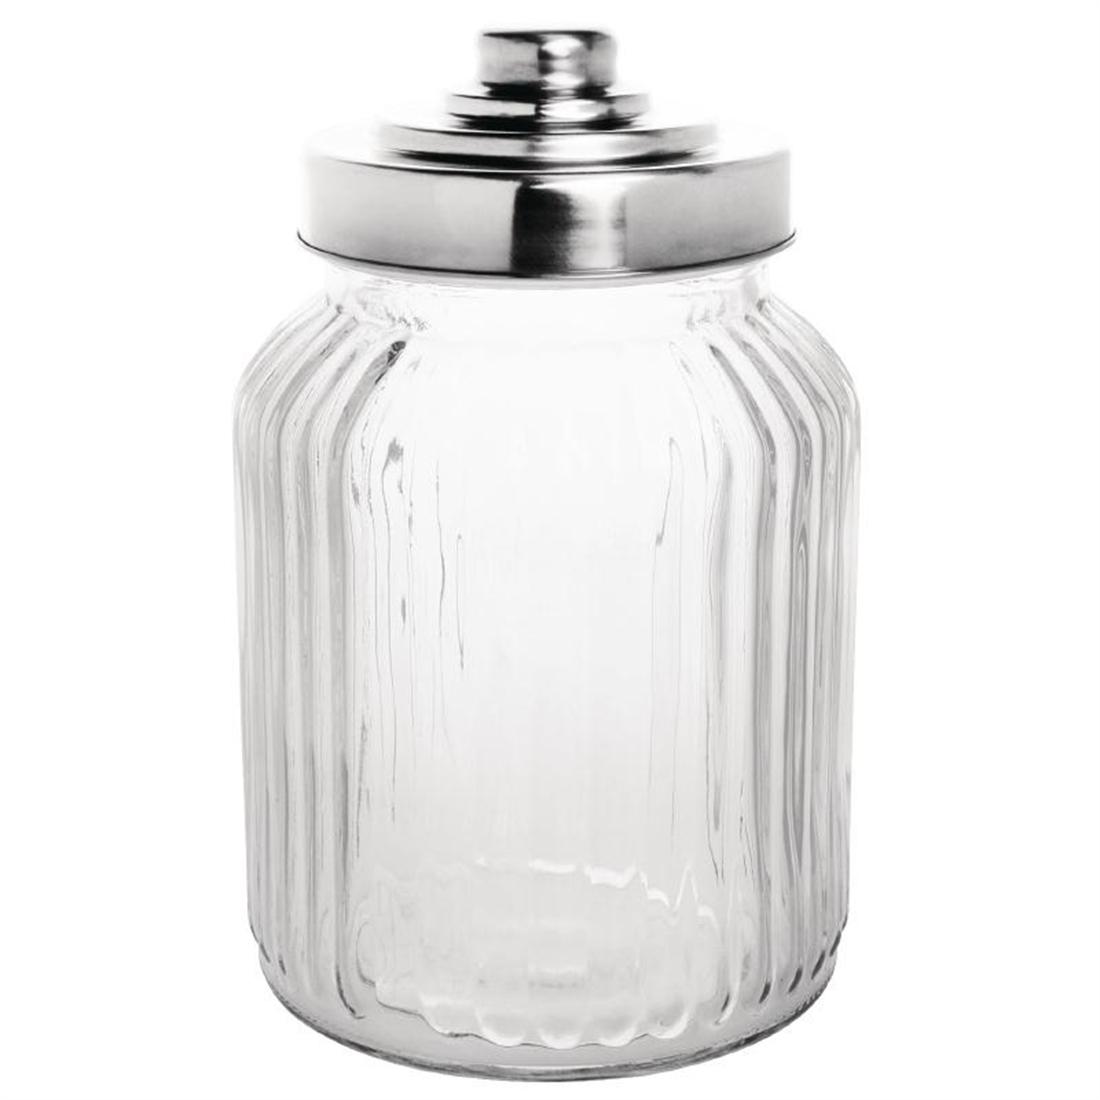 Ml Ribbed Glass Jar